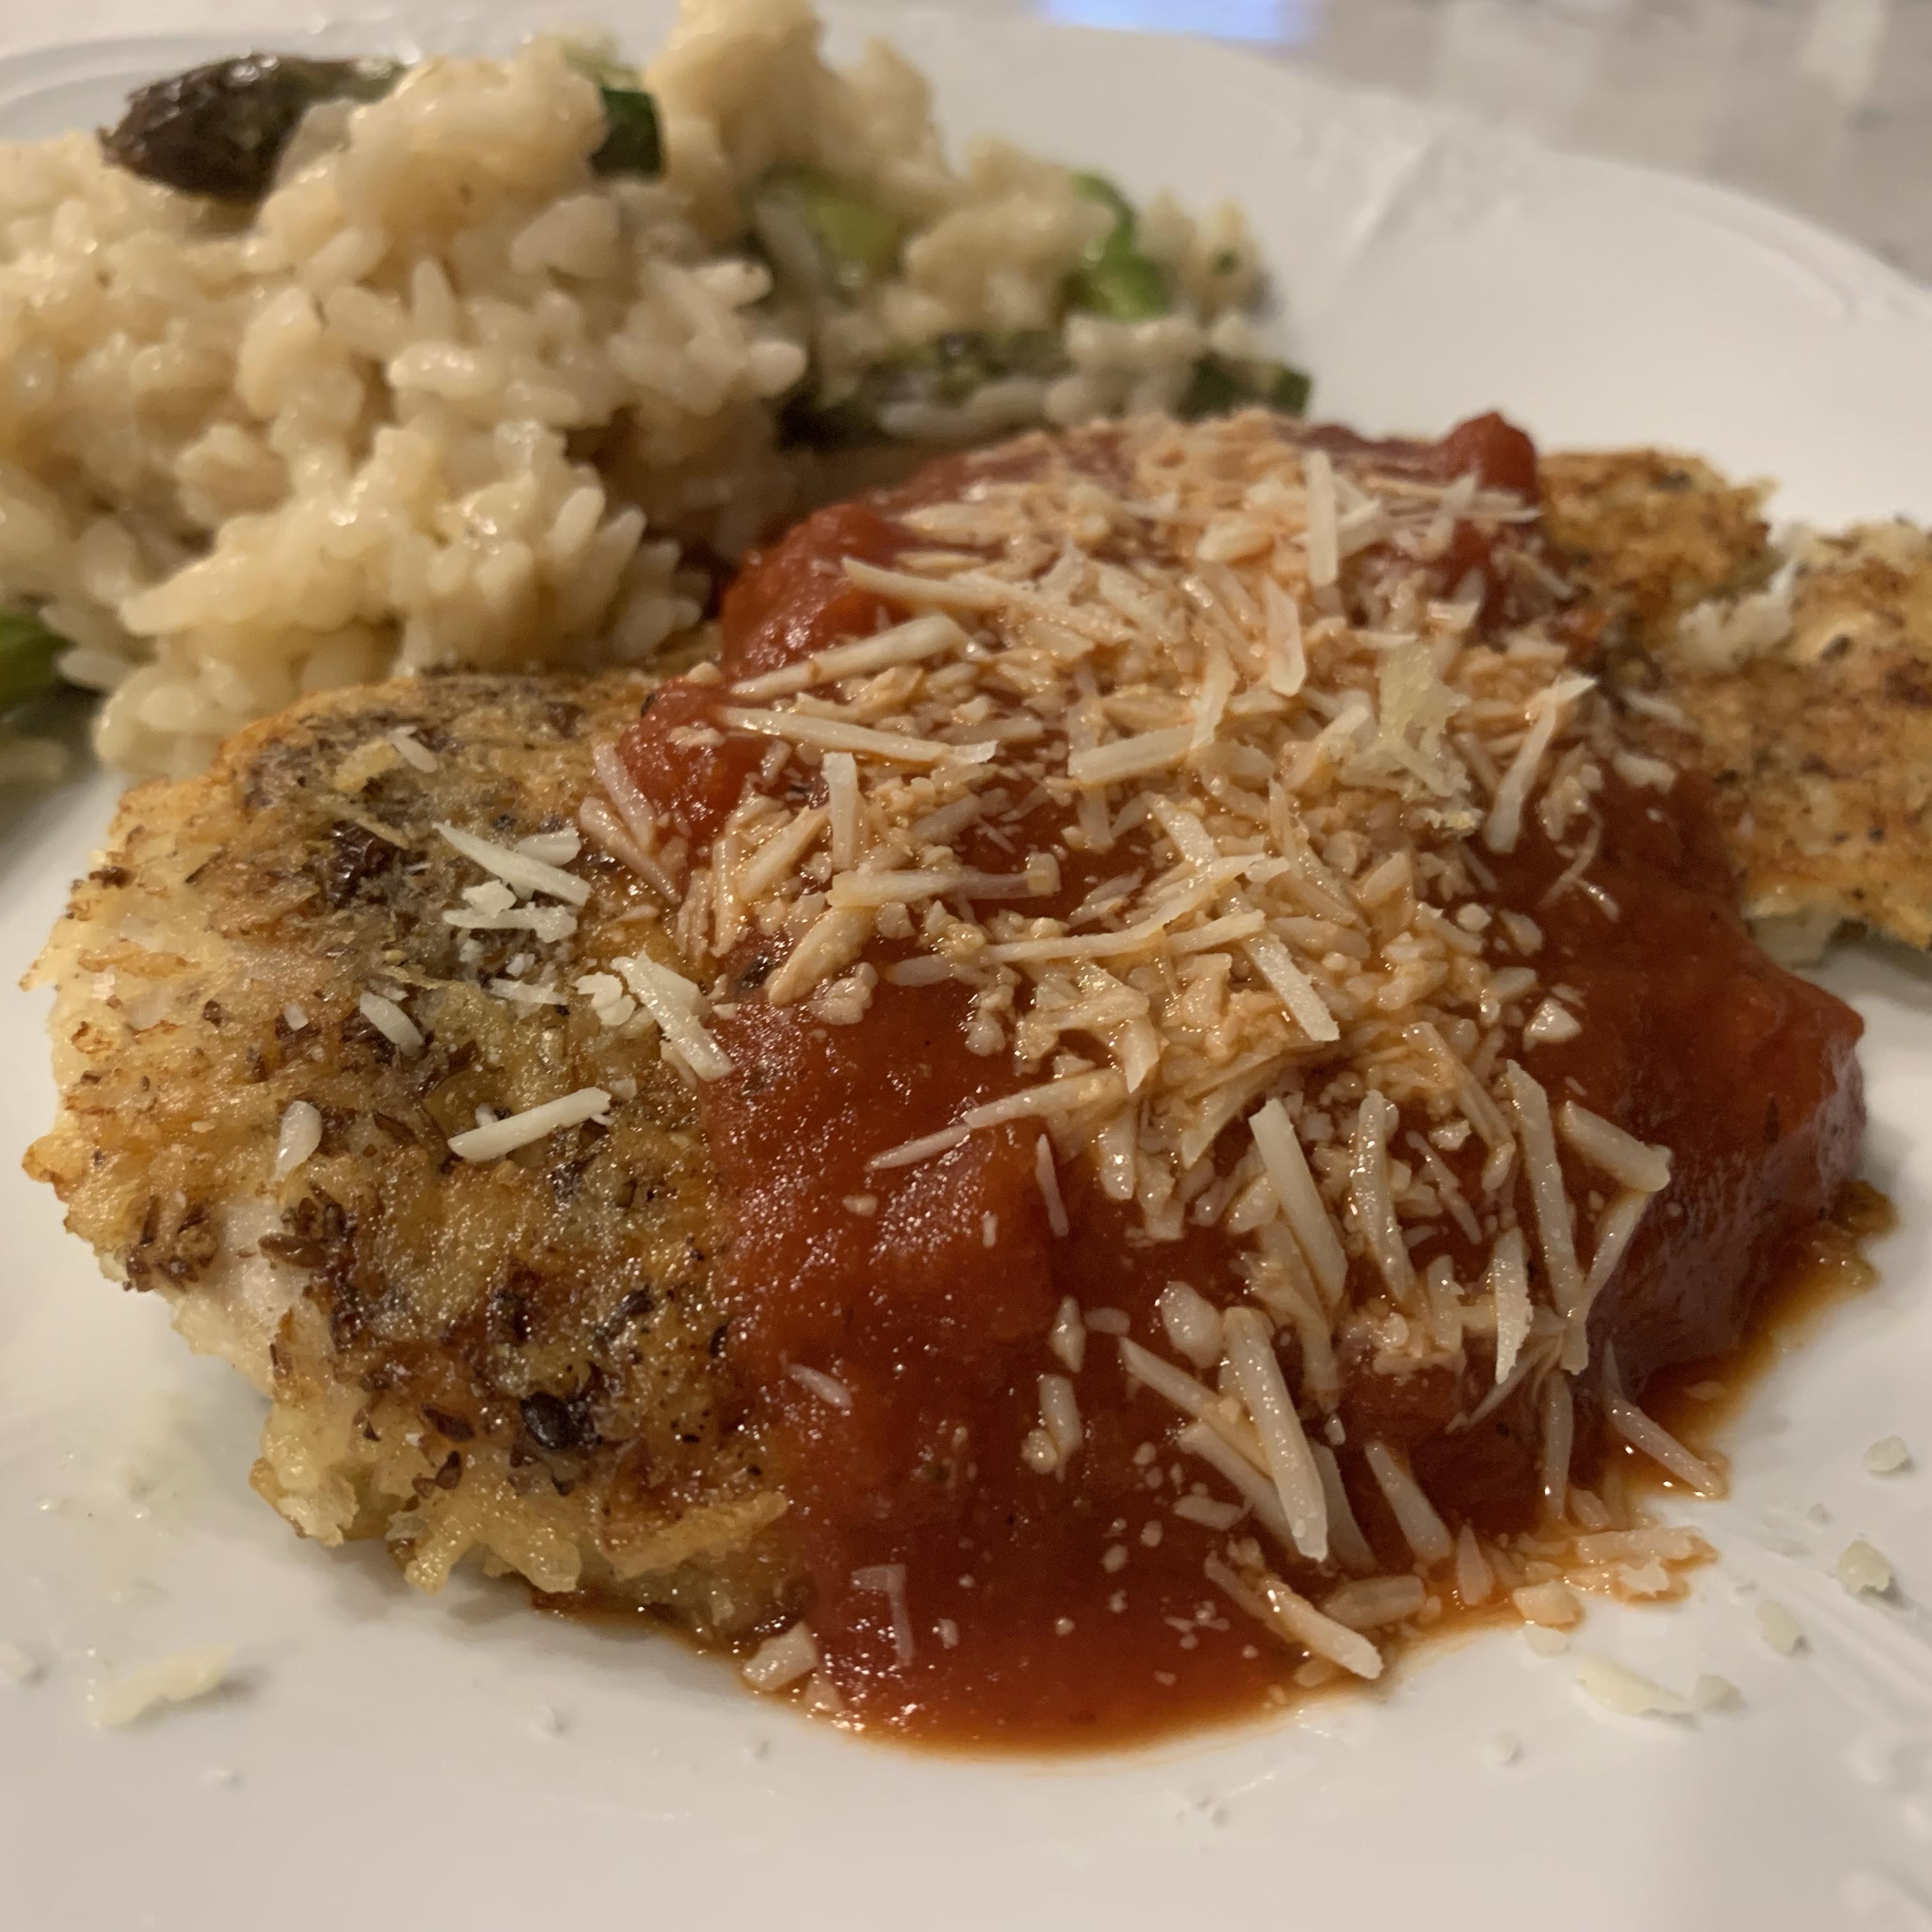 Homemade Chicken Parmigiana Amy Rathbone Wellenkamp